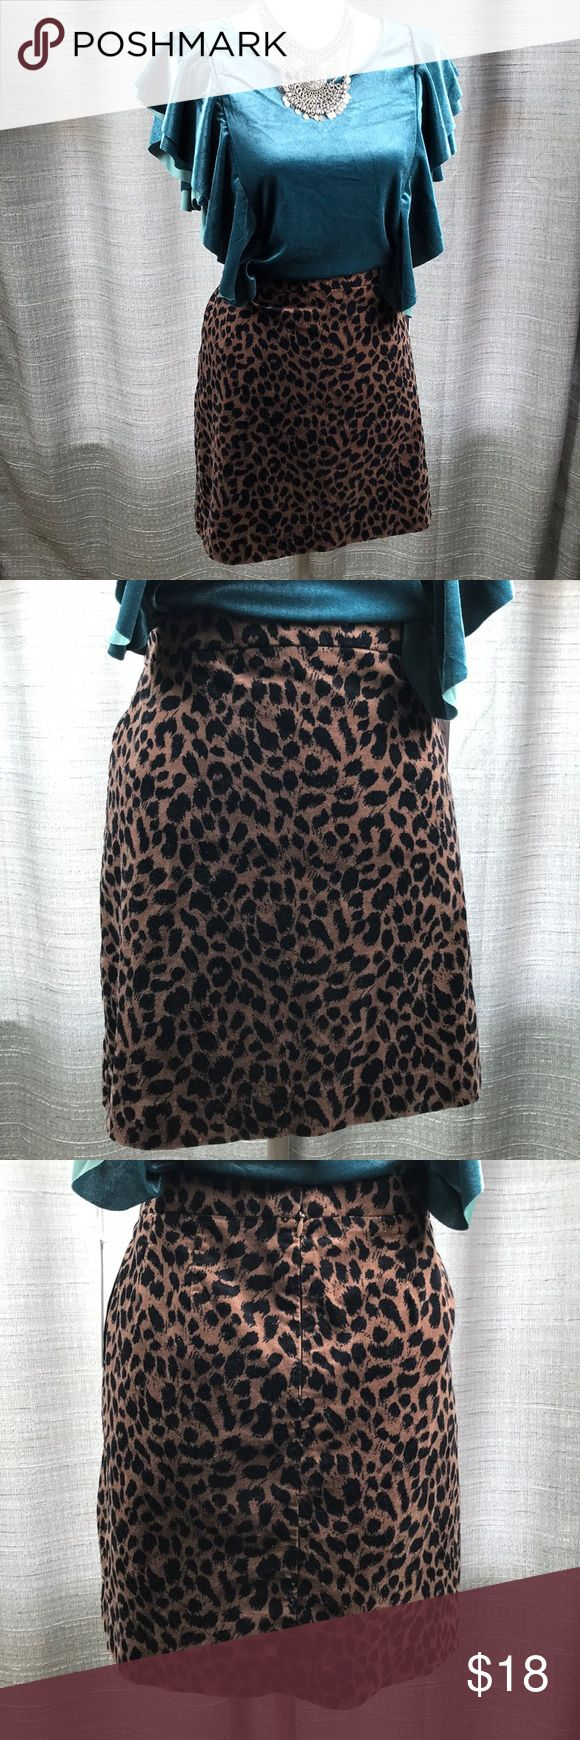 "NWT Ann Taylor Loft Leopard Print Skirt Velvet like material with brown and black leopard print. Zipper in the back. Length 17"" Hips 20"" waist 16"" LOFT Skirts Mini"